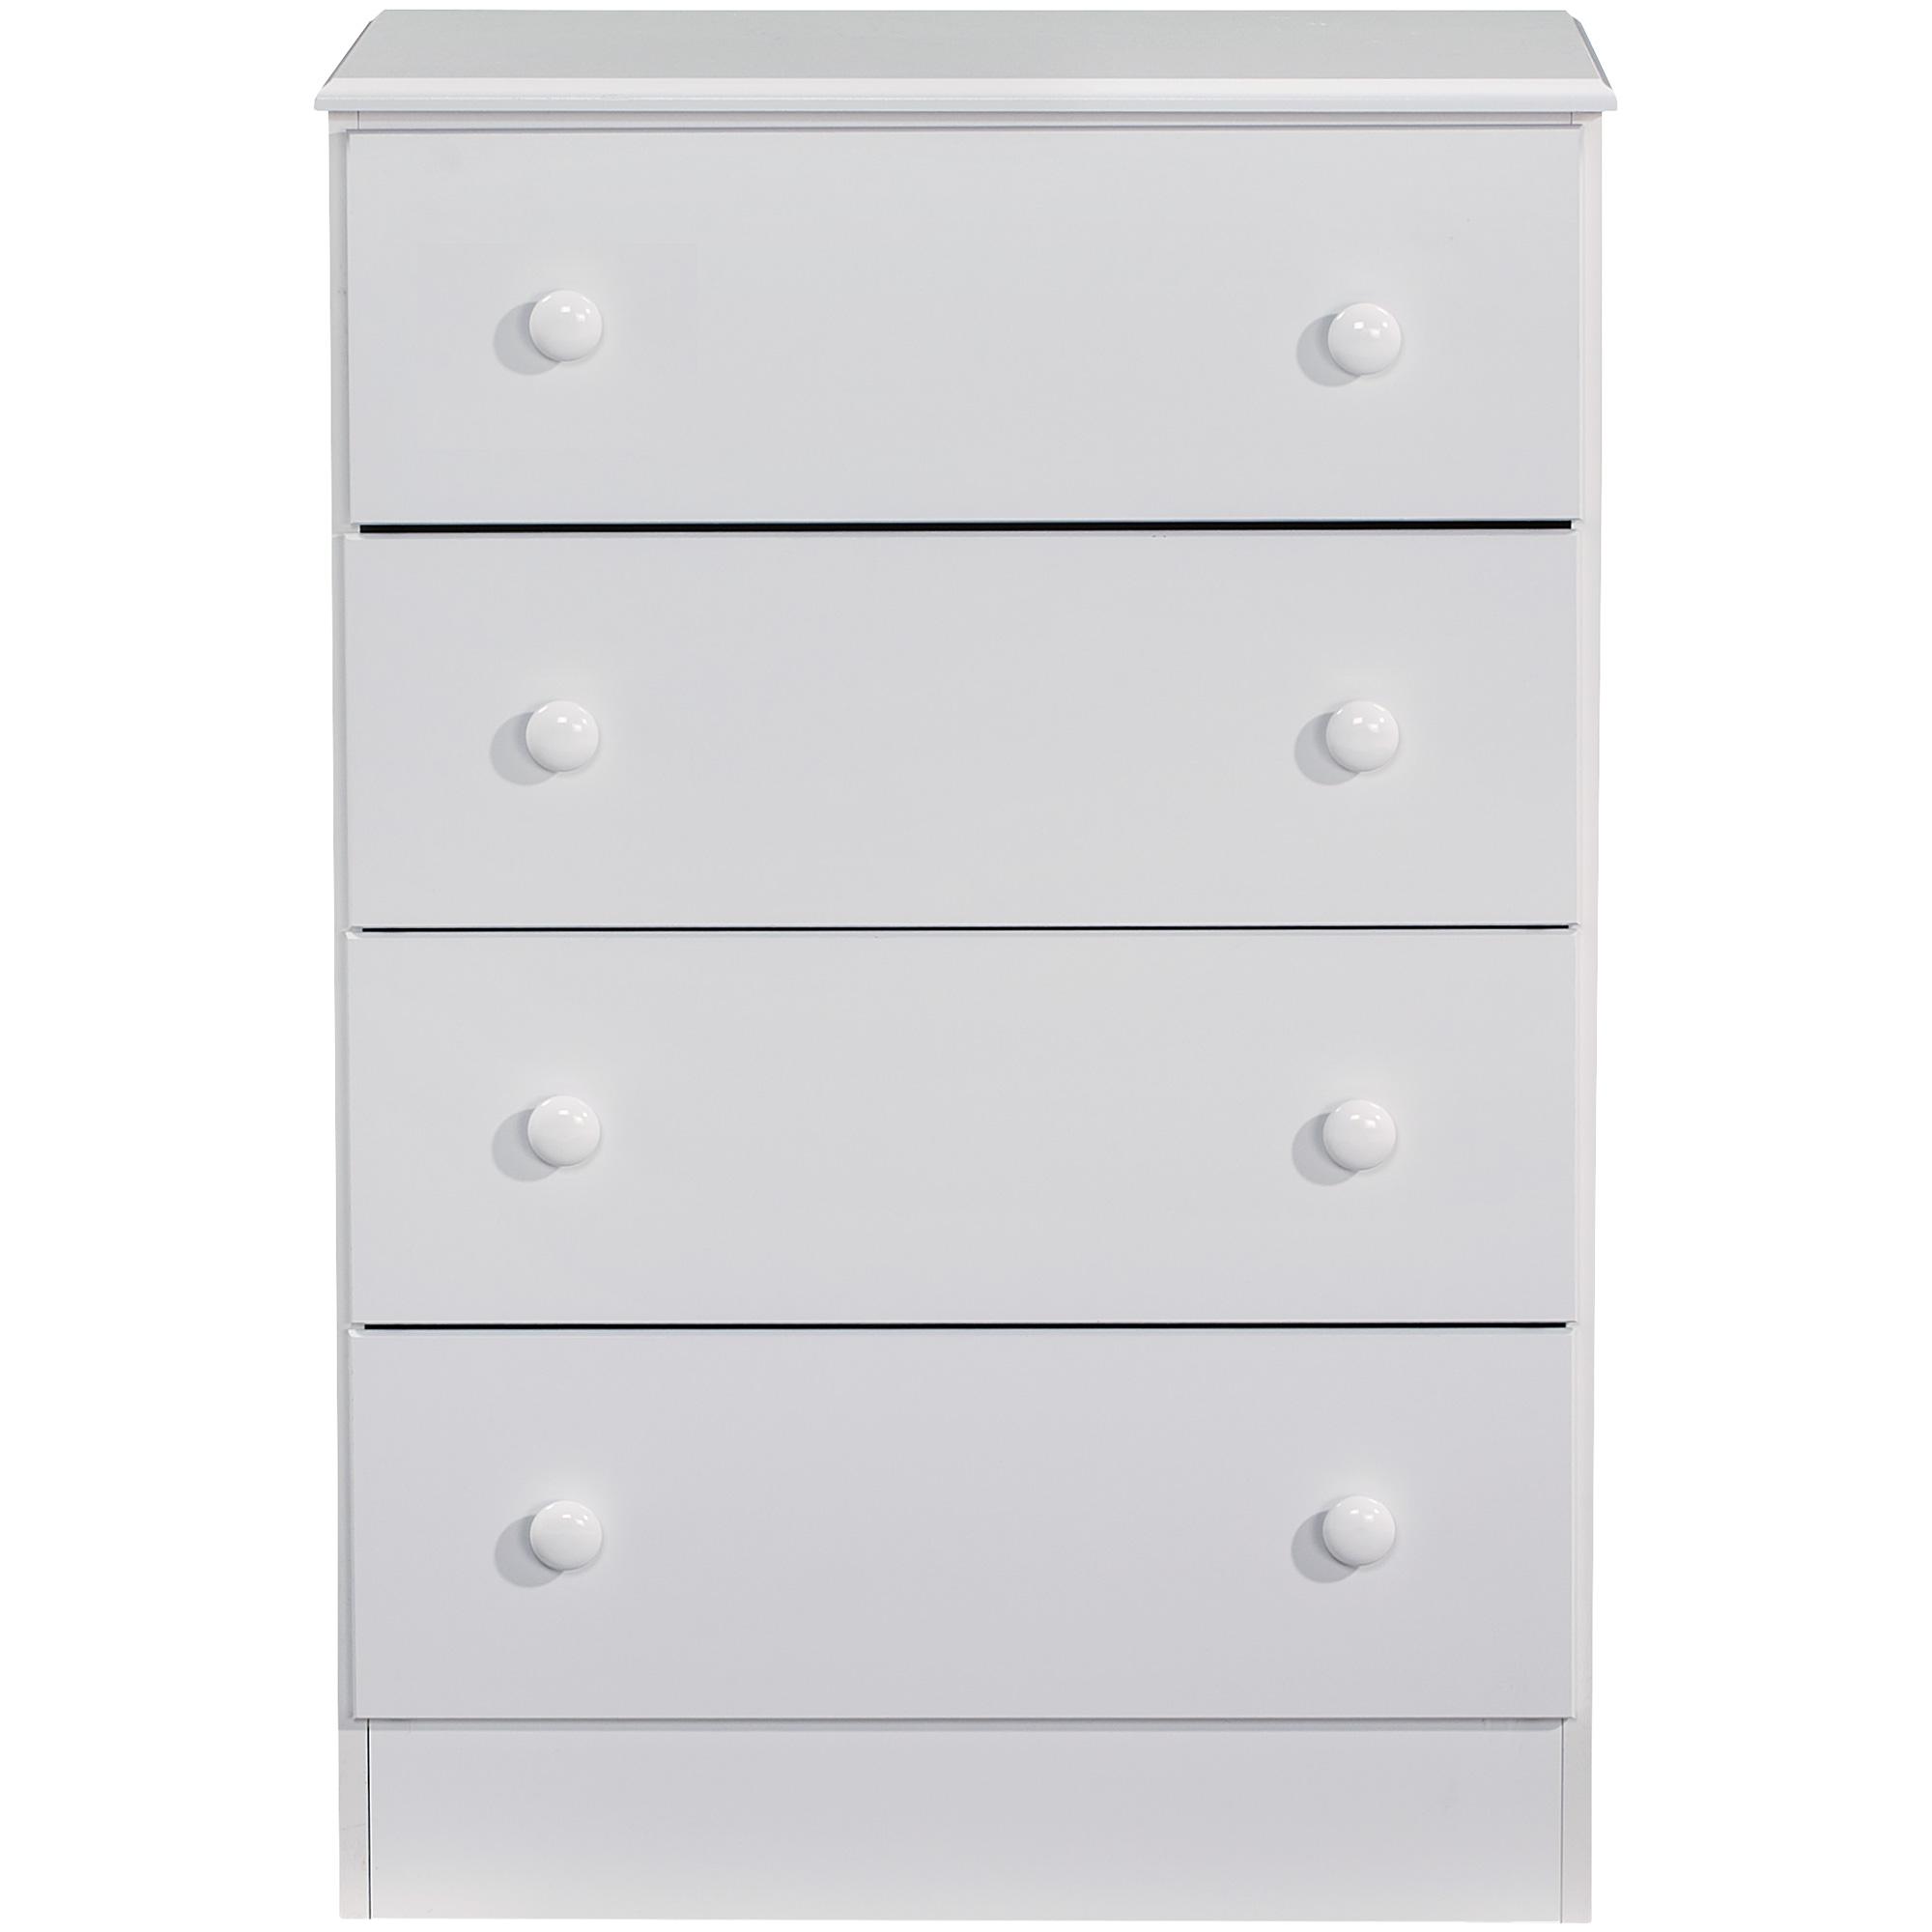 Kith Furniture | Allison White 4 Drawer Chest